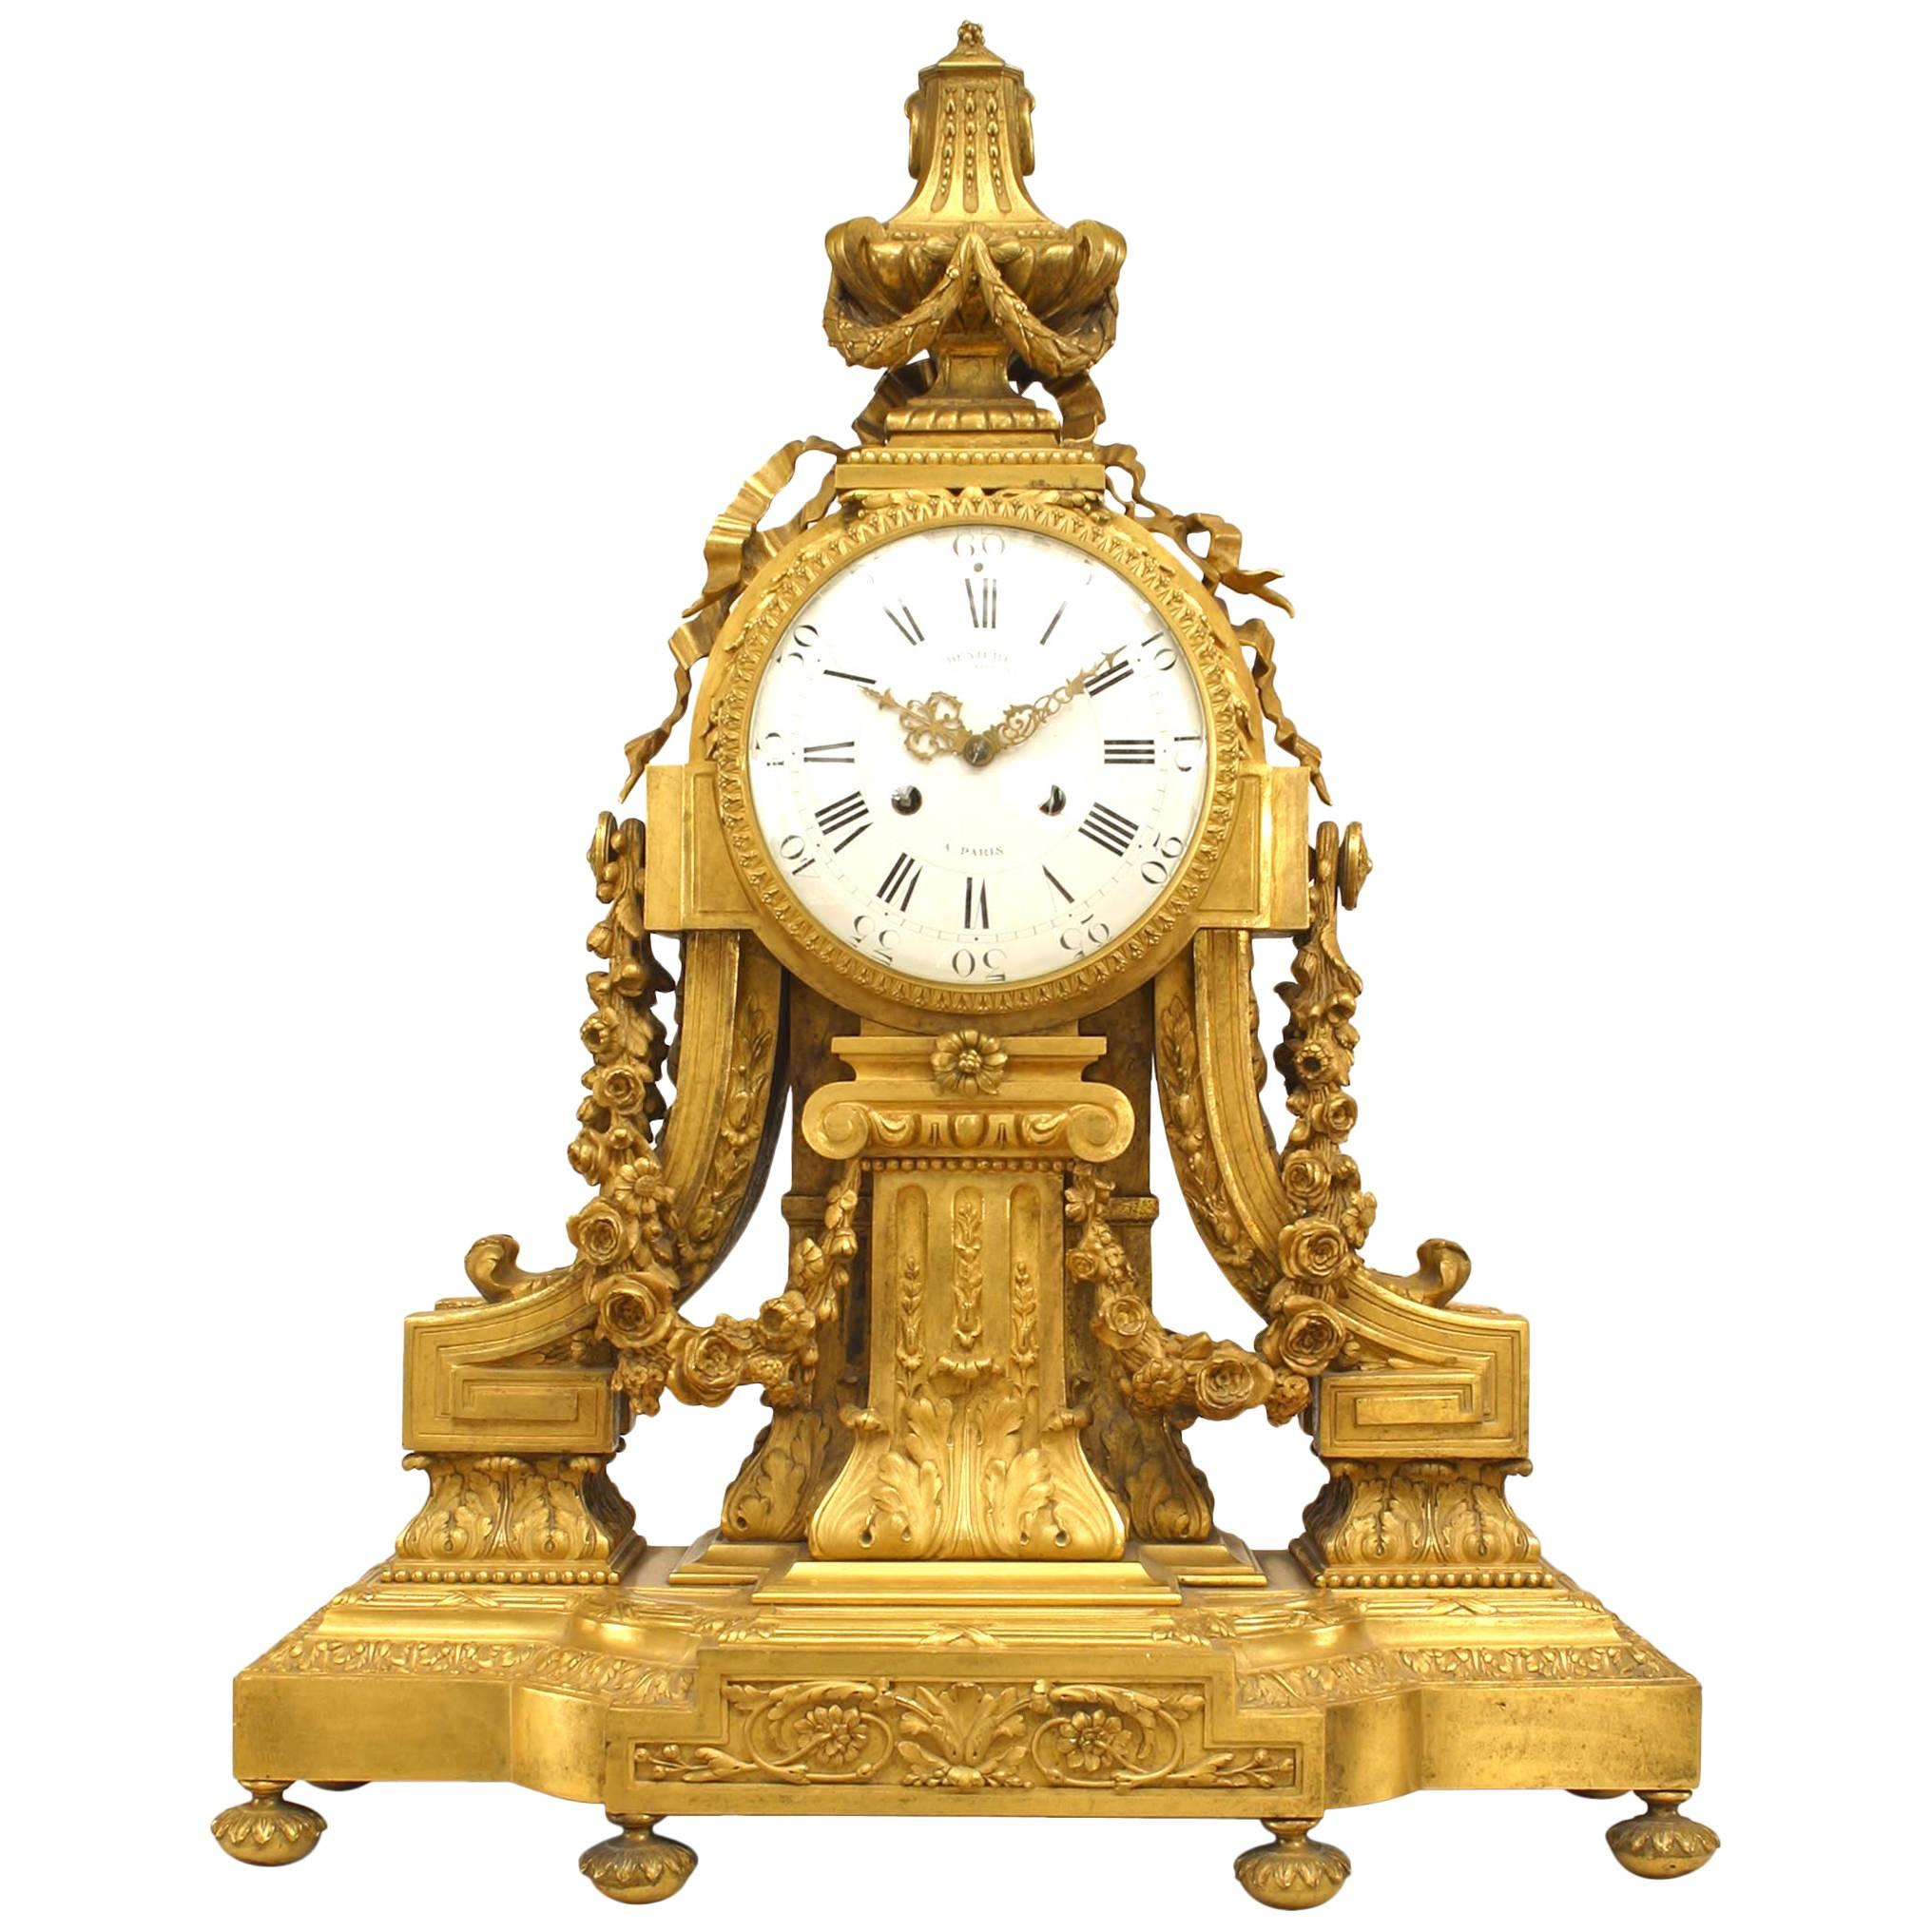 French Louis XVI Style 19th Century Gilt Bronze Mantle Clock